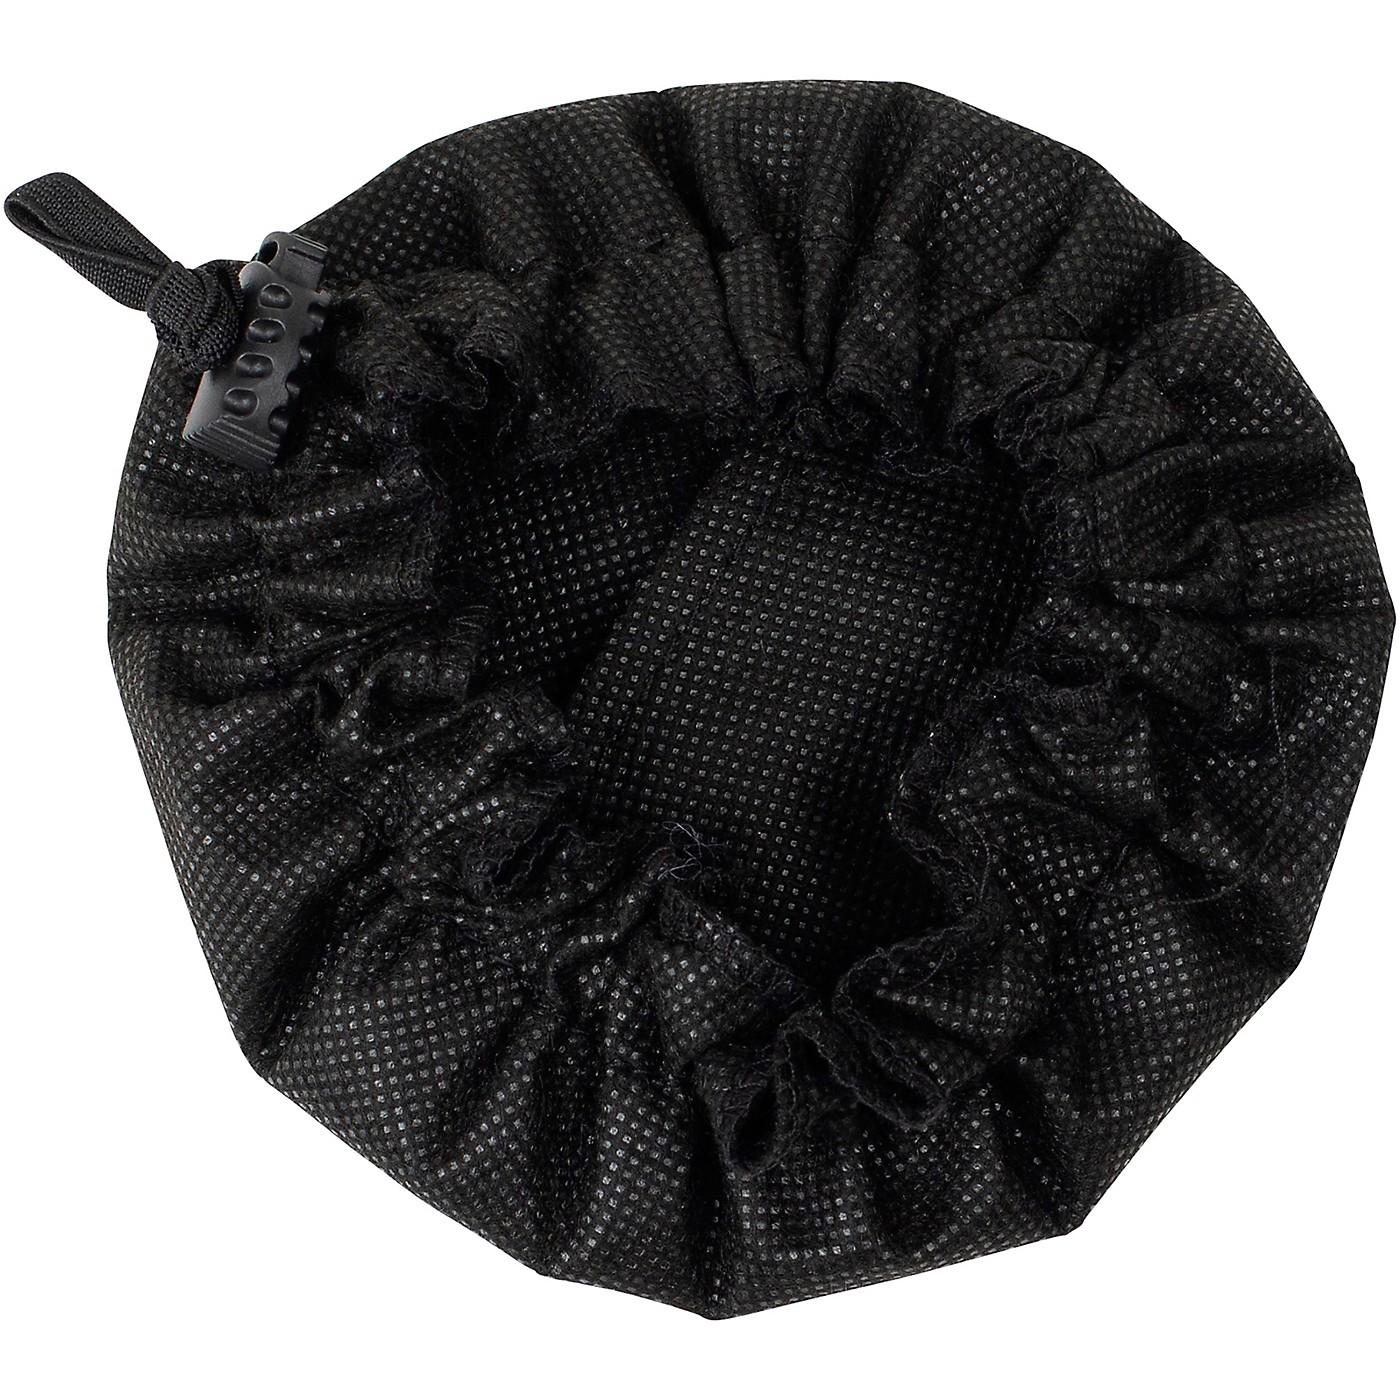 Gator Black Bell Mask With MERV-13 Filter, 4-5